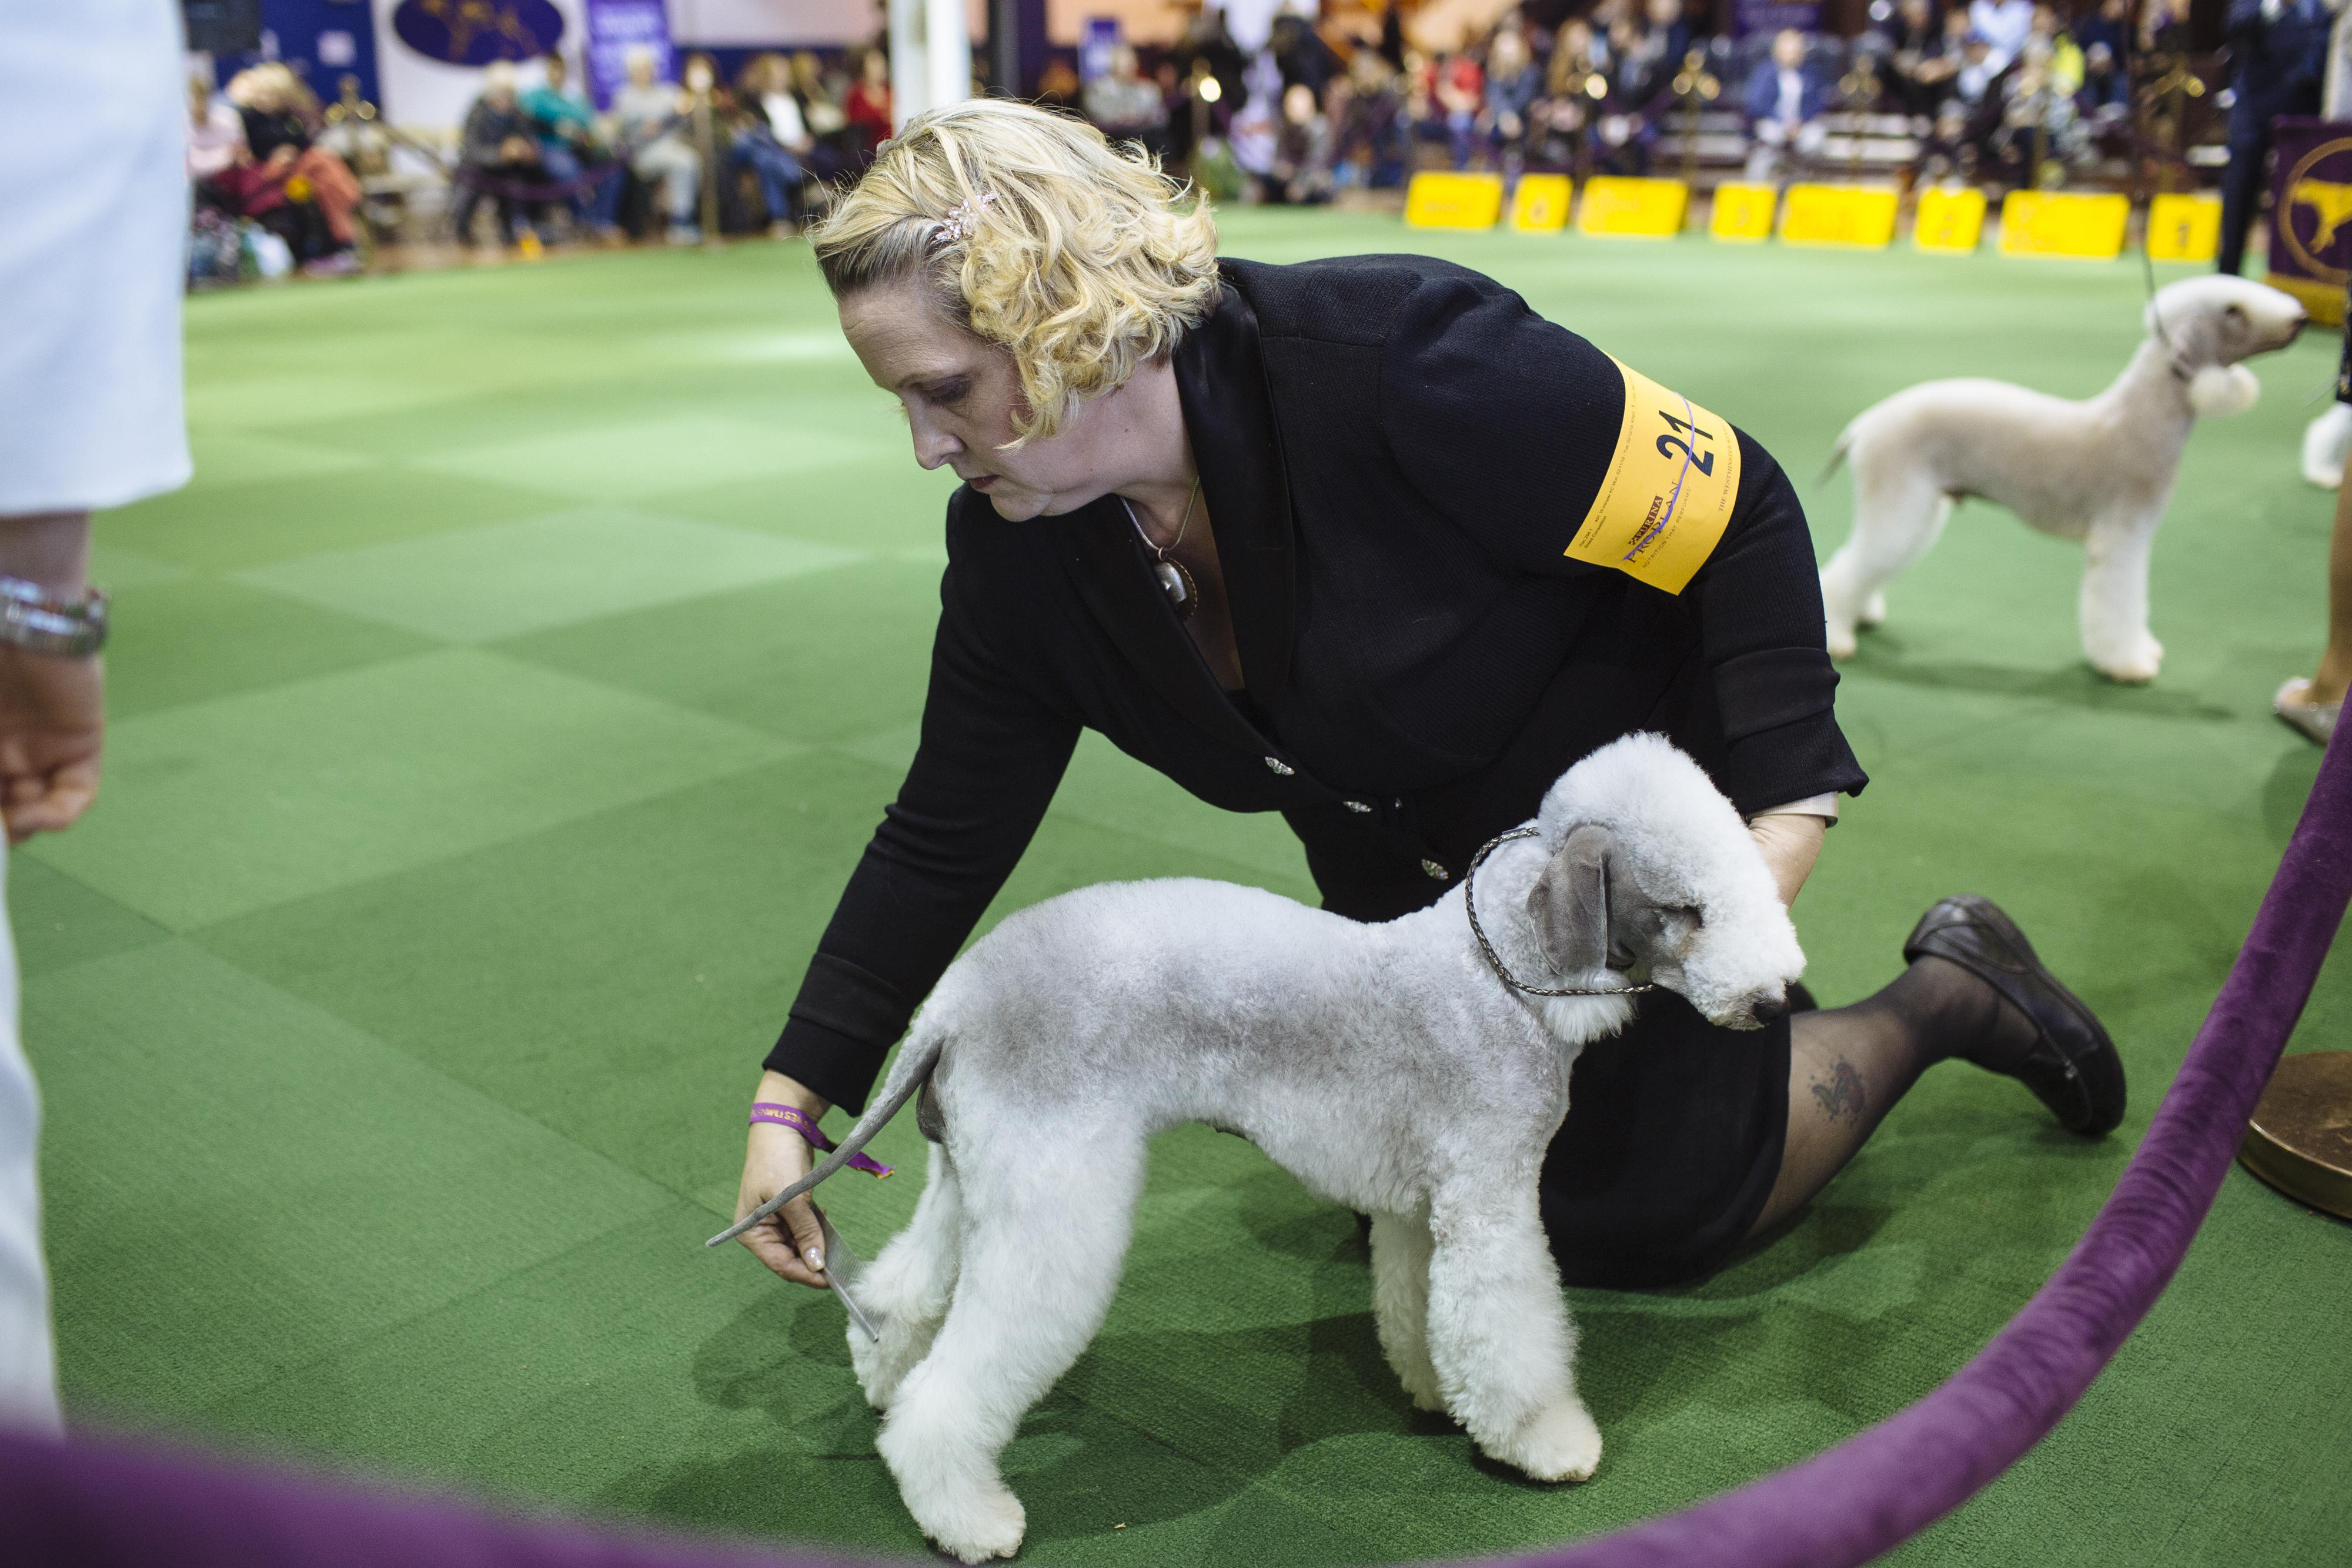 Westminster dog show winner: King, a wire fox terrier, wins